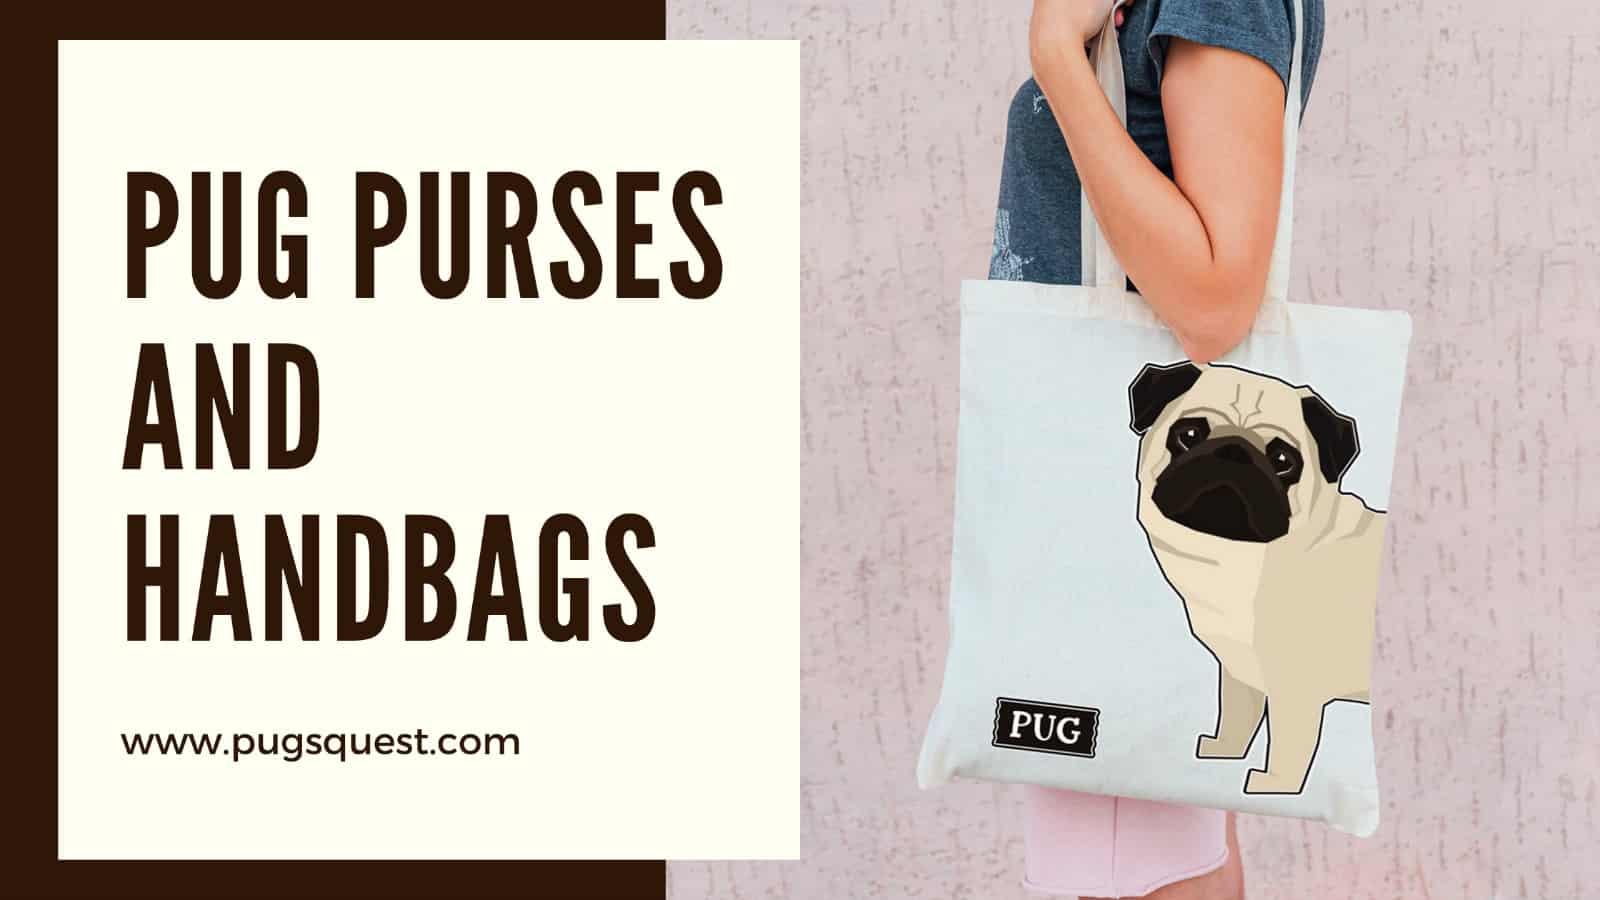 Pug Purses And Handbags